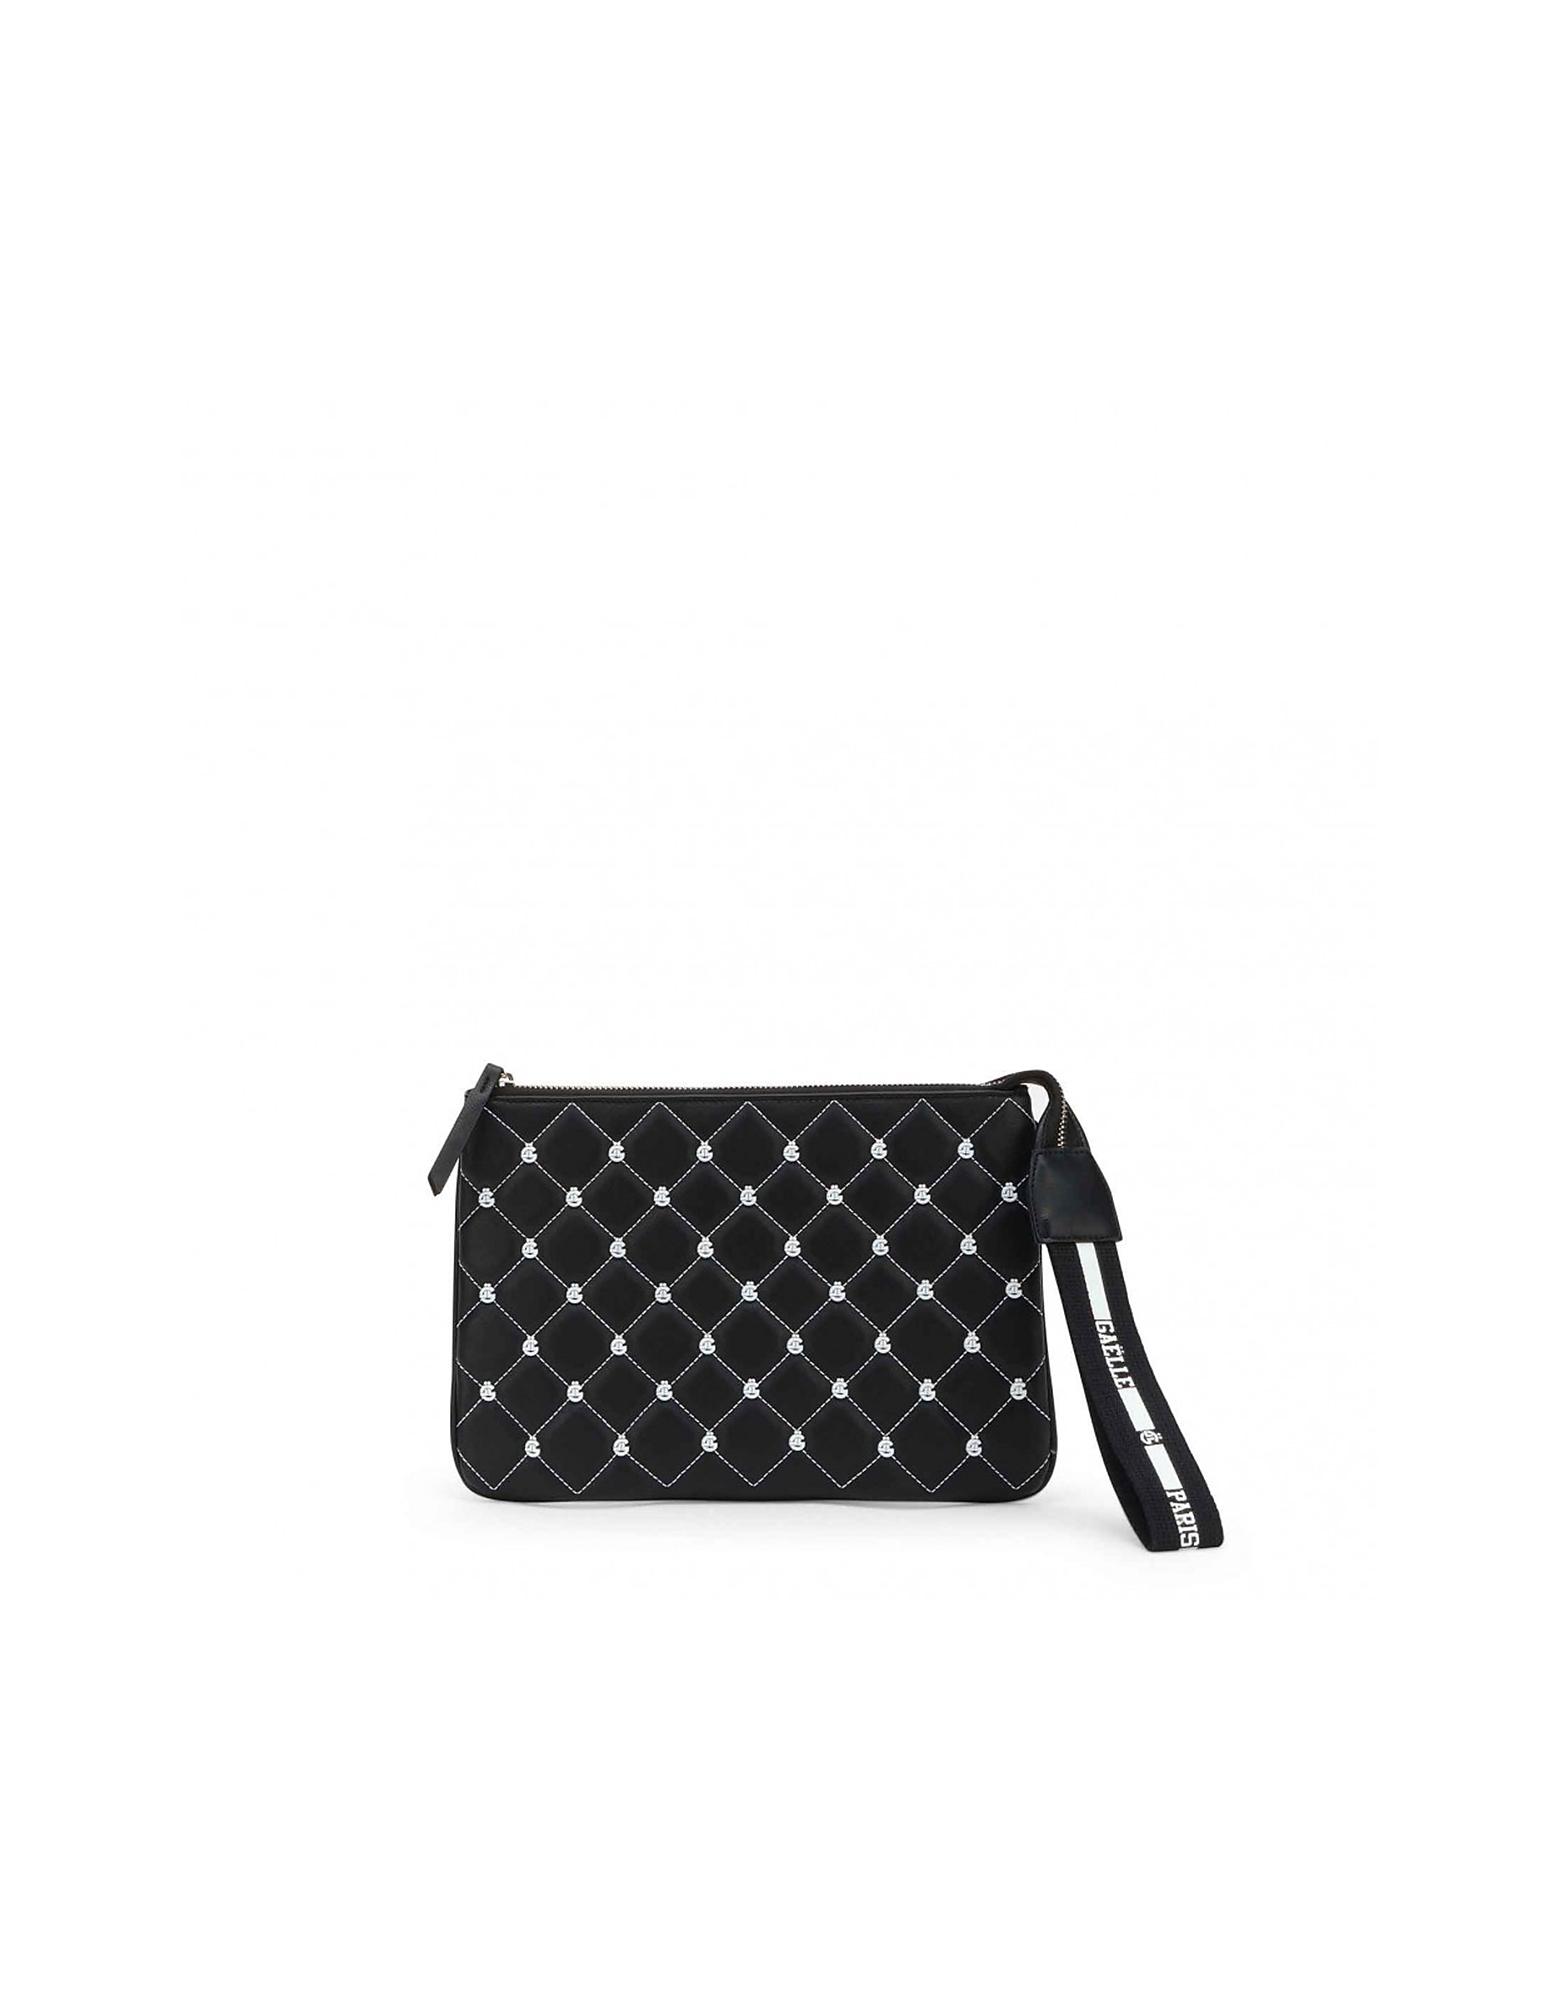 GAELLE PARIS Designer Travel Bags, Women's Black Beauty Case